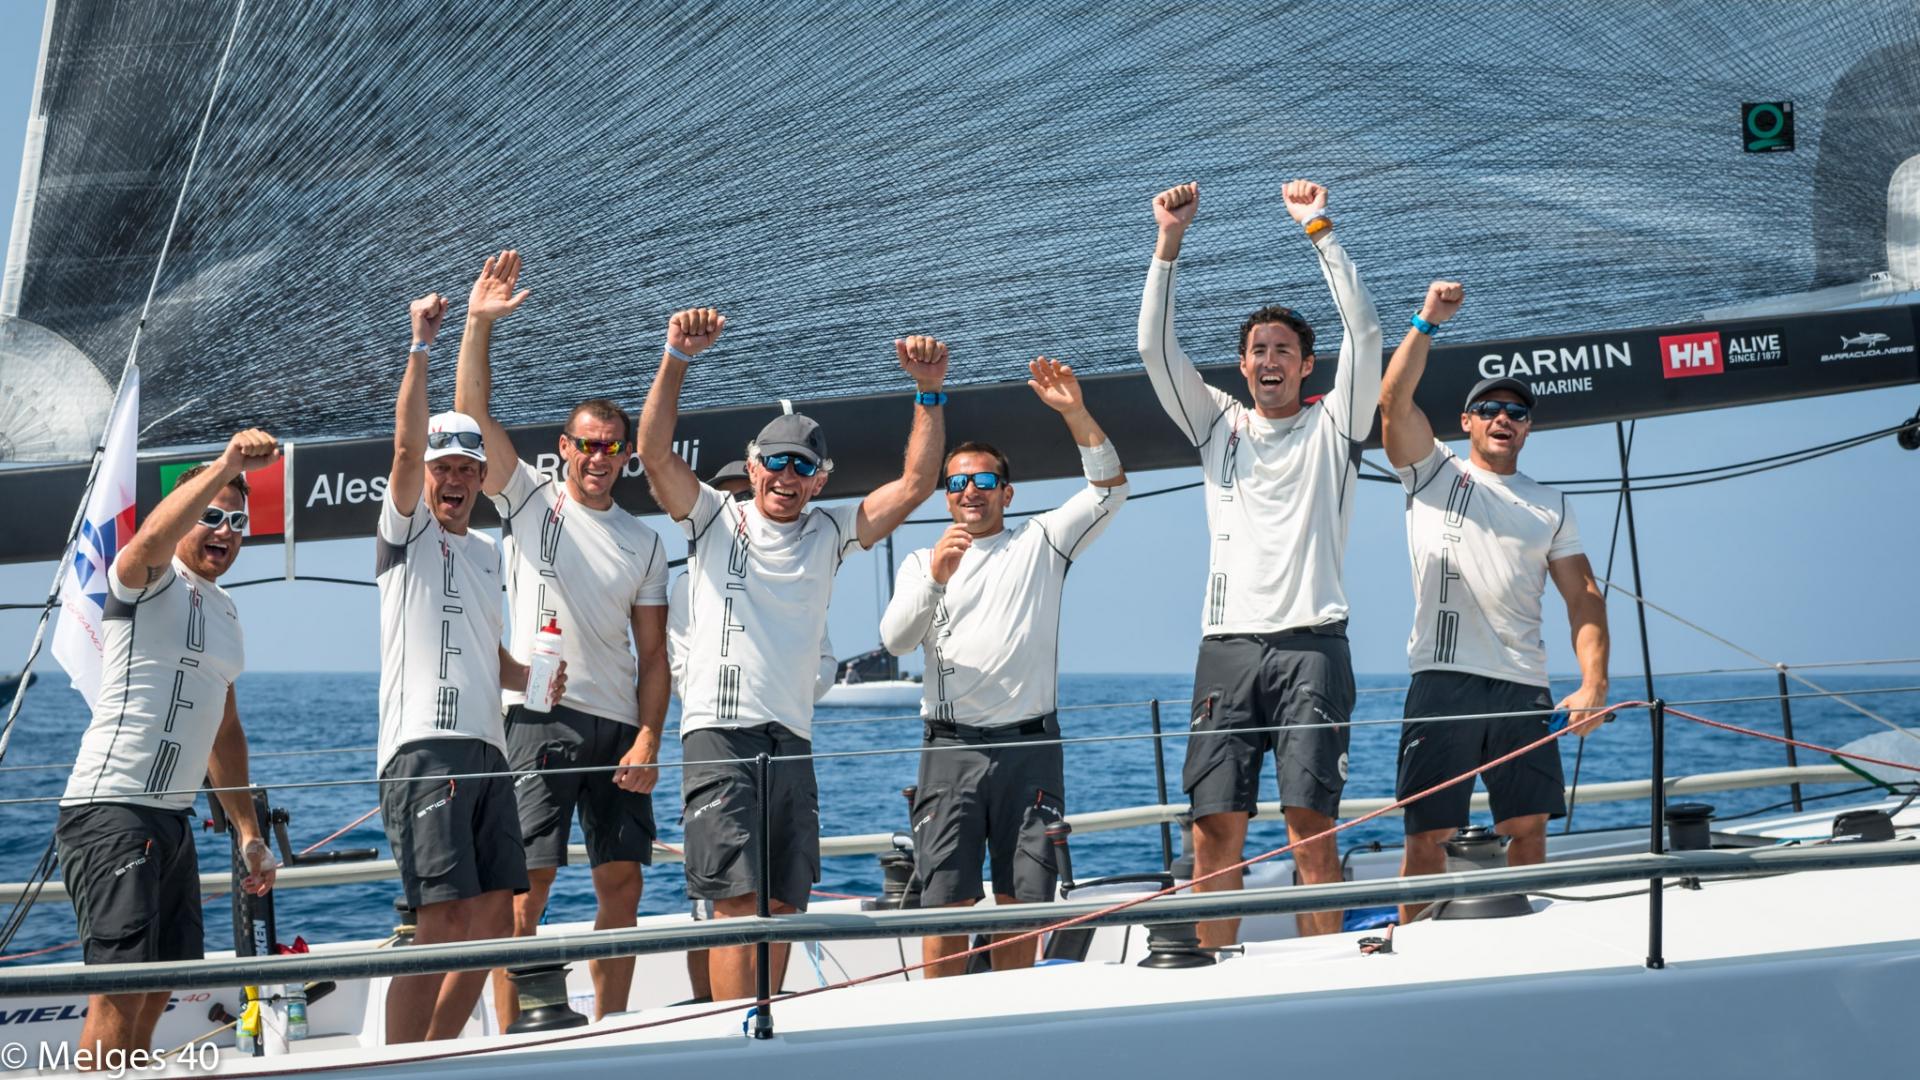 Melges 40 Grand Prix: Stig vince la prima assoluta in Costa Smeralda - NEWS - Yacht Club Costa Smeralda